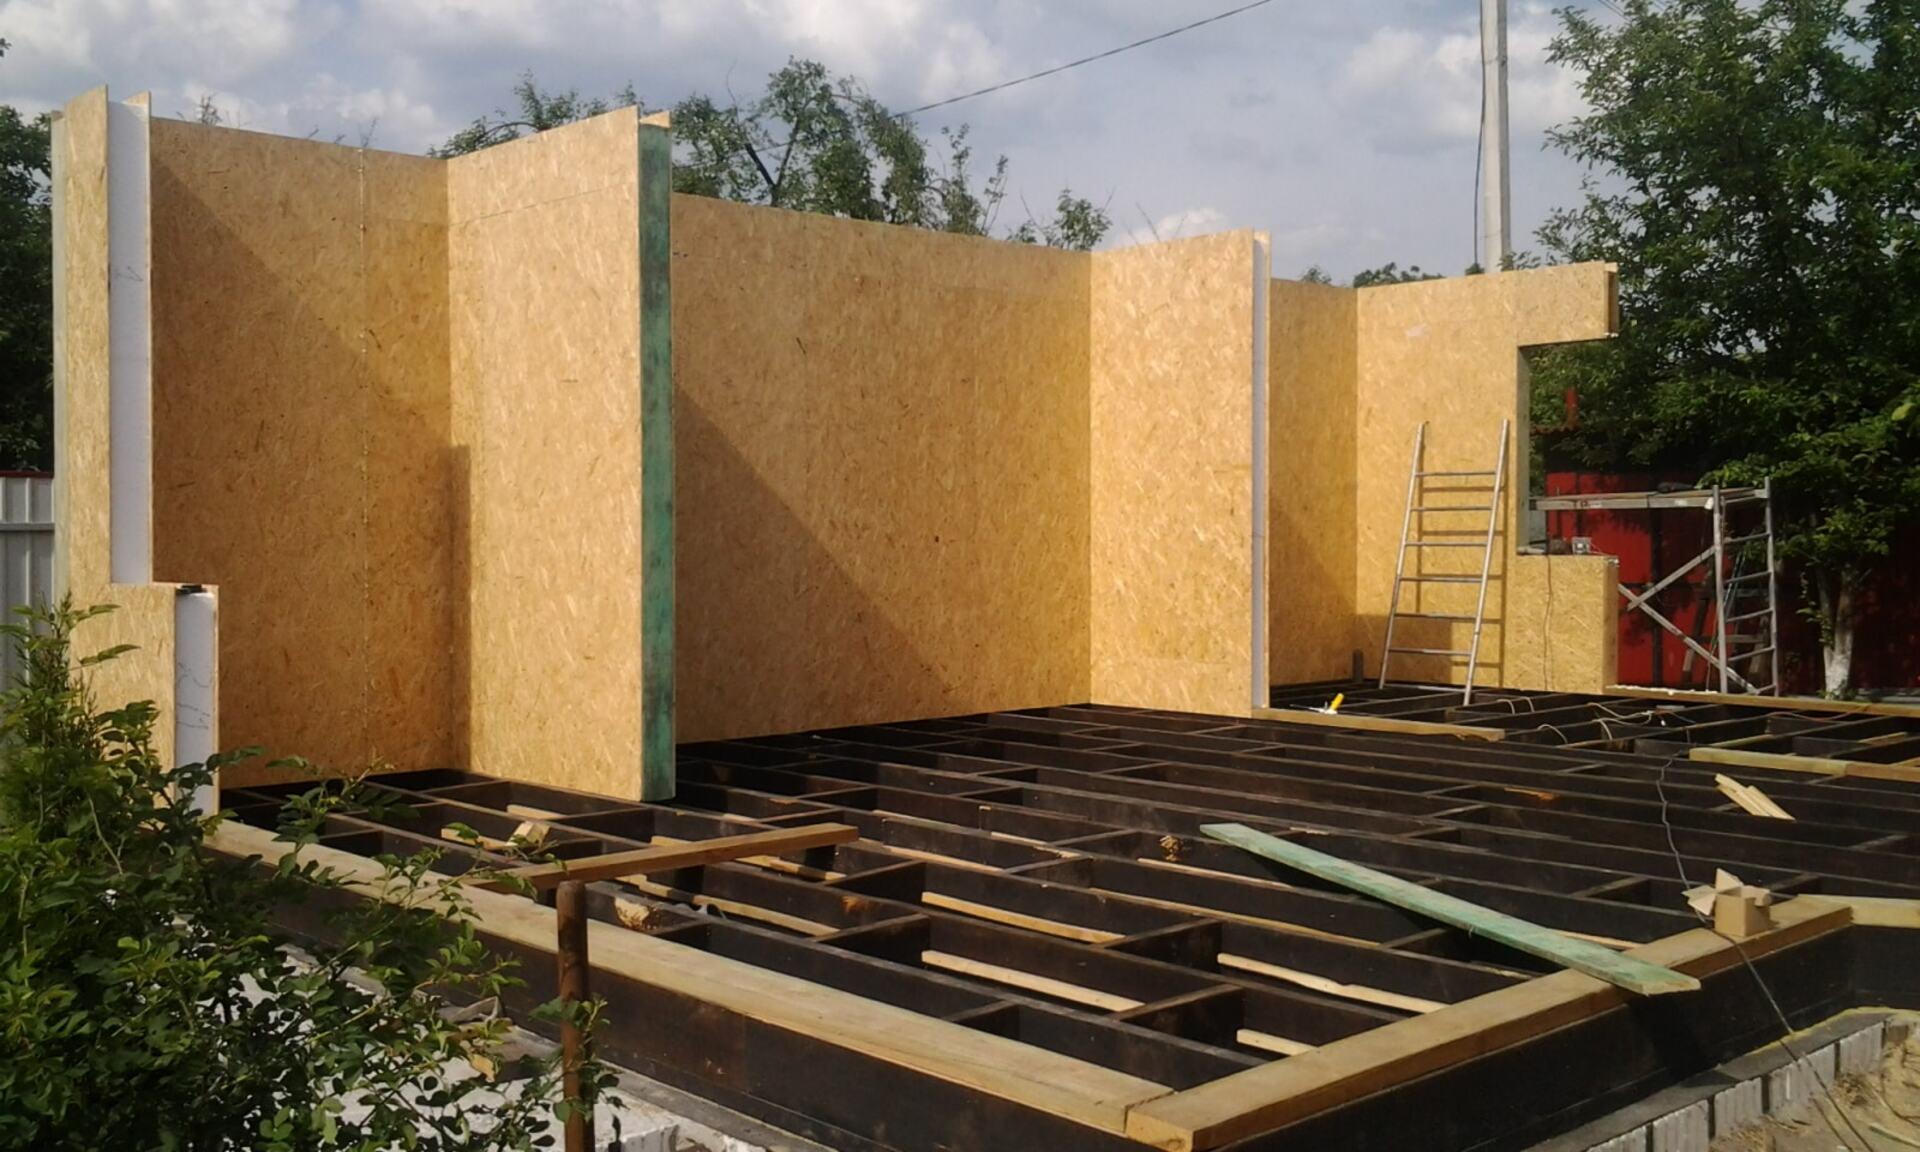 Сборка домов по каркасной технологии - фото